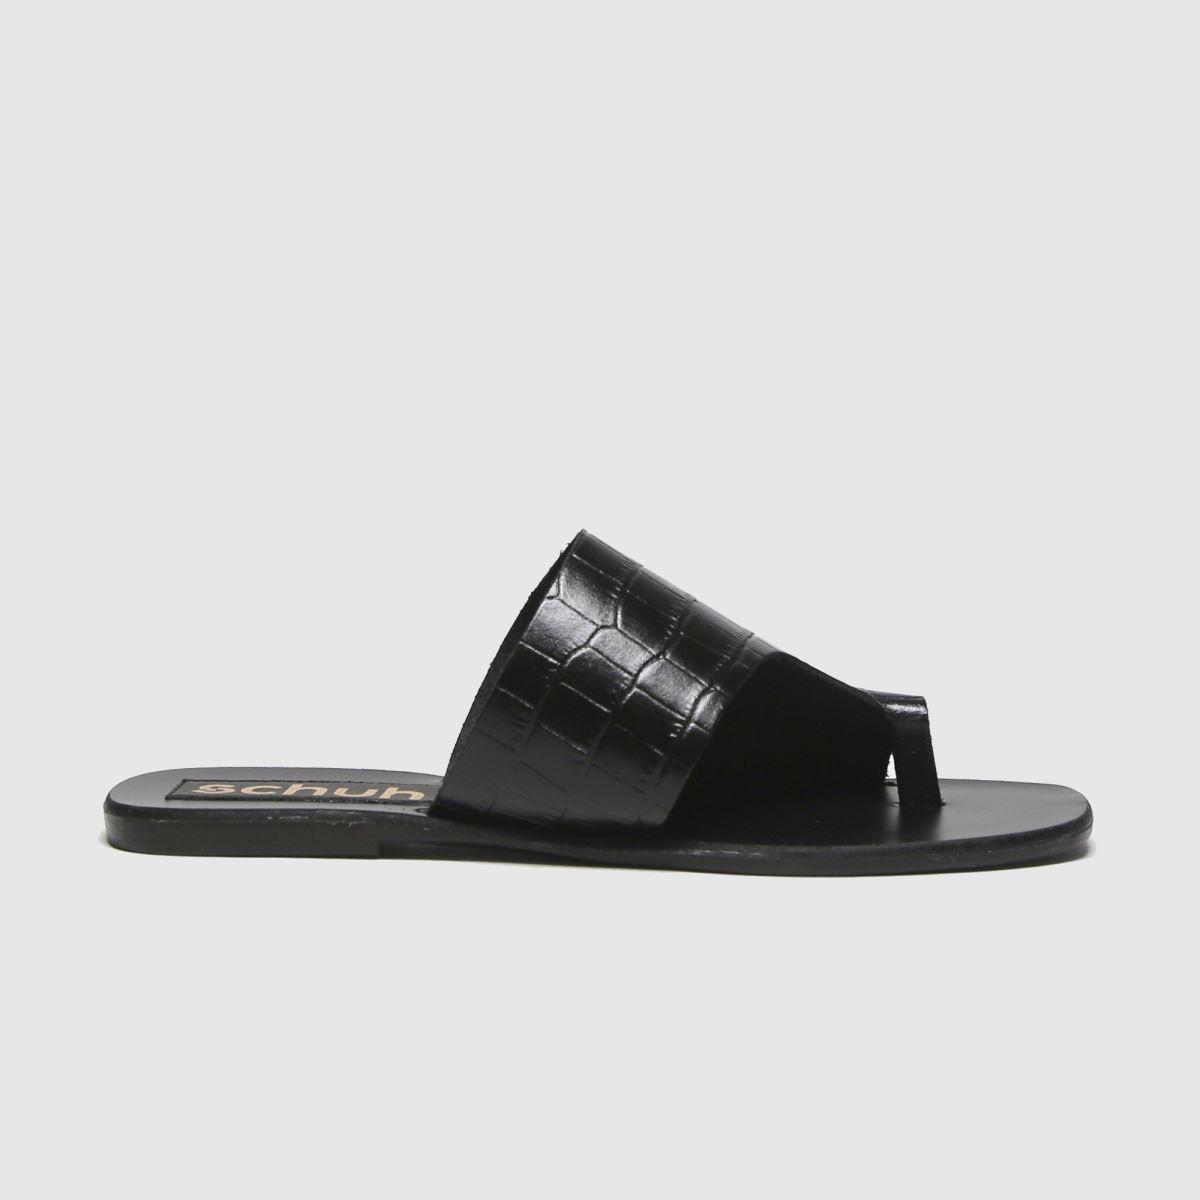 schuh Schuh Black Copenhagen Leather Mule Sandals